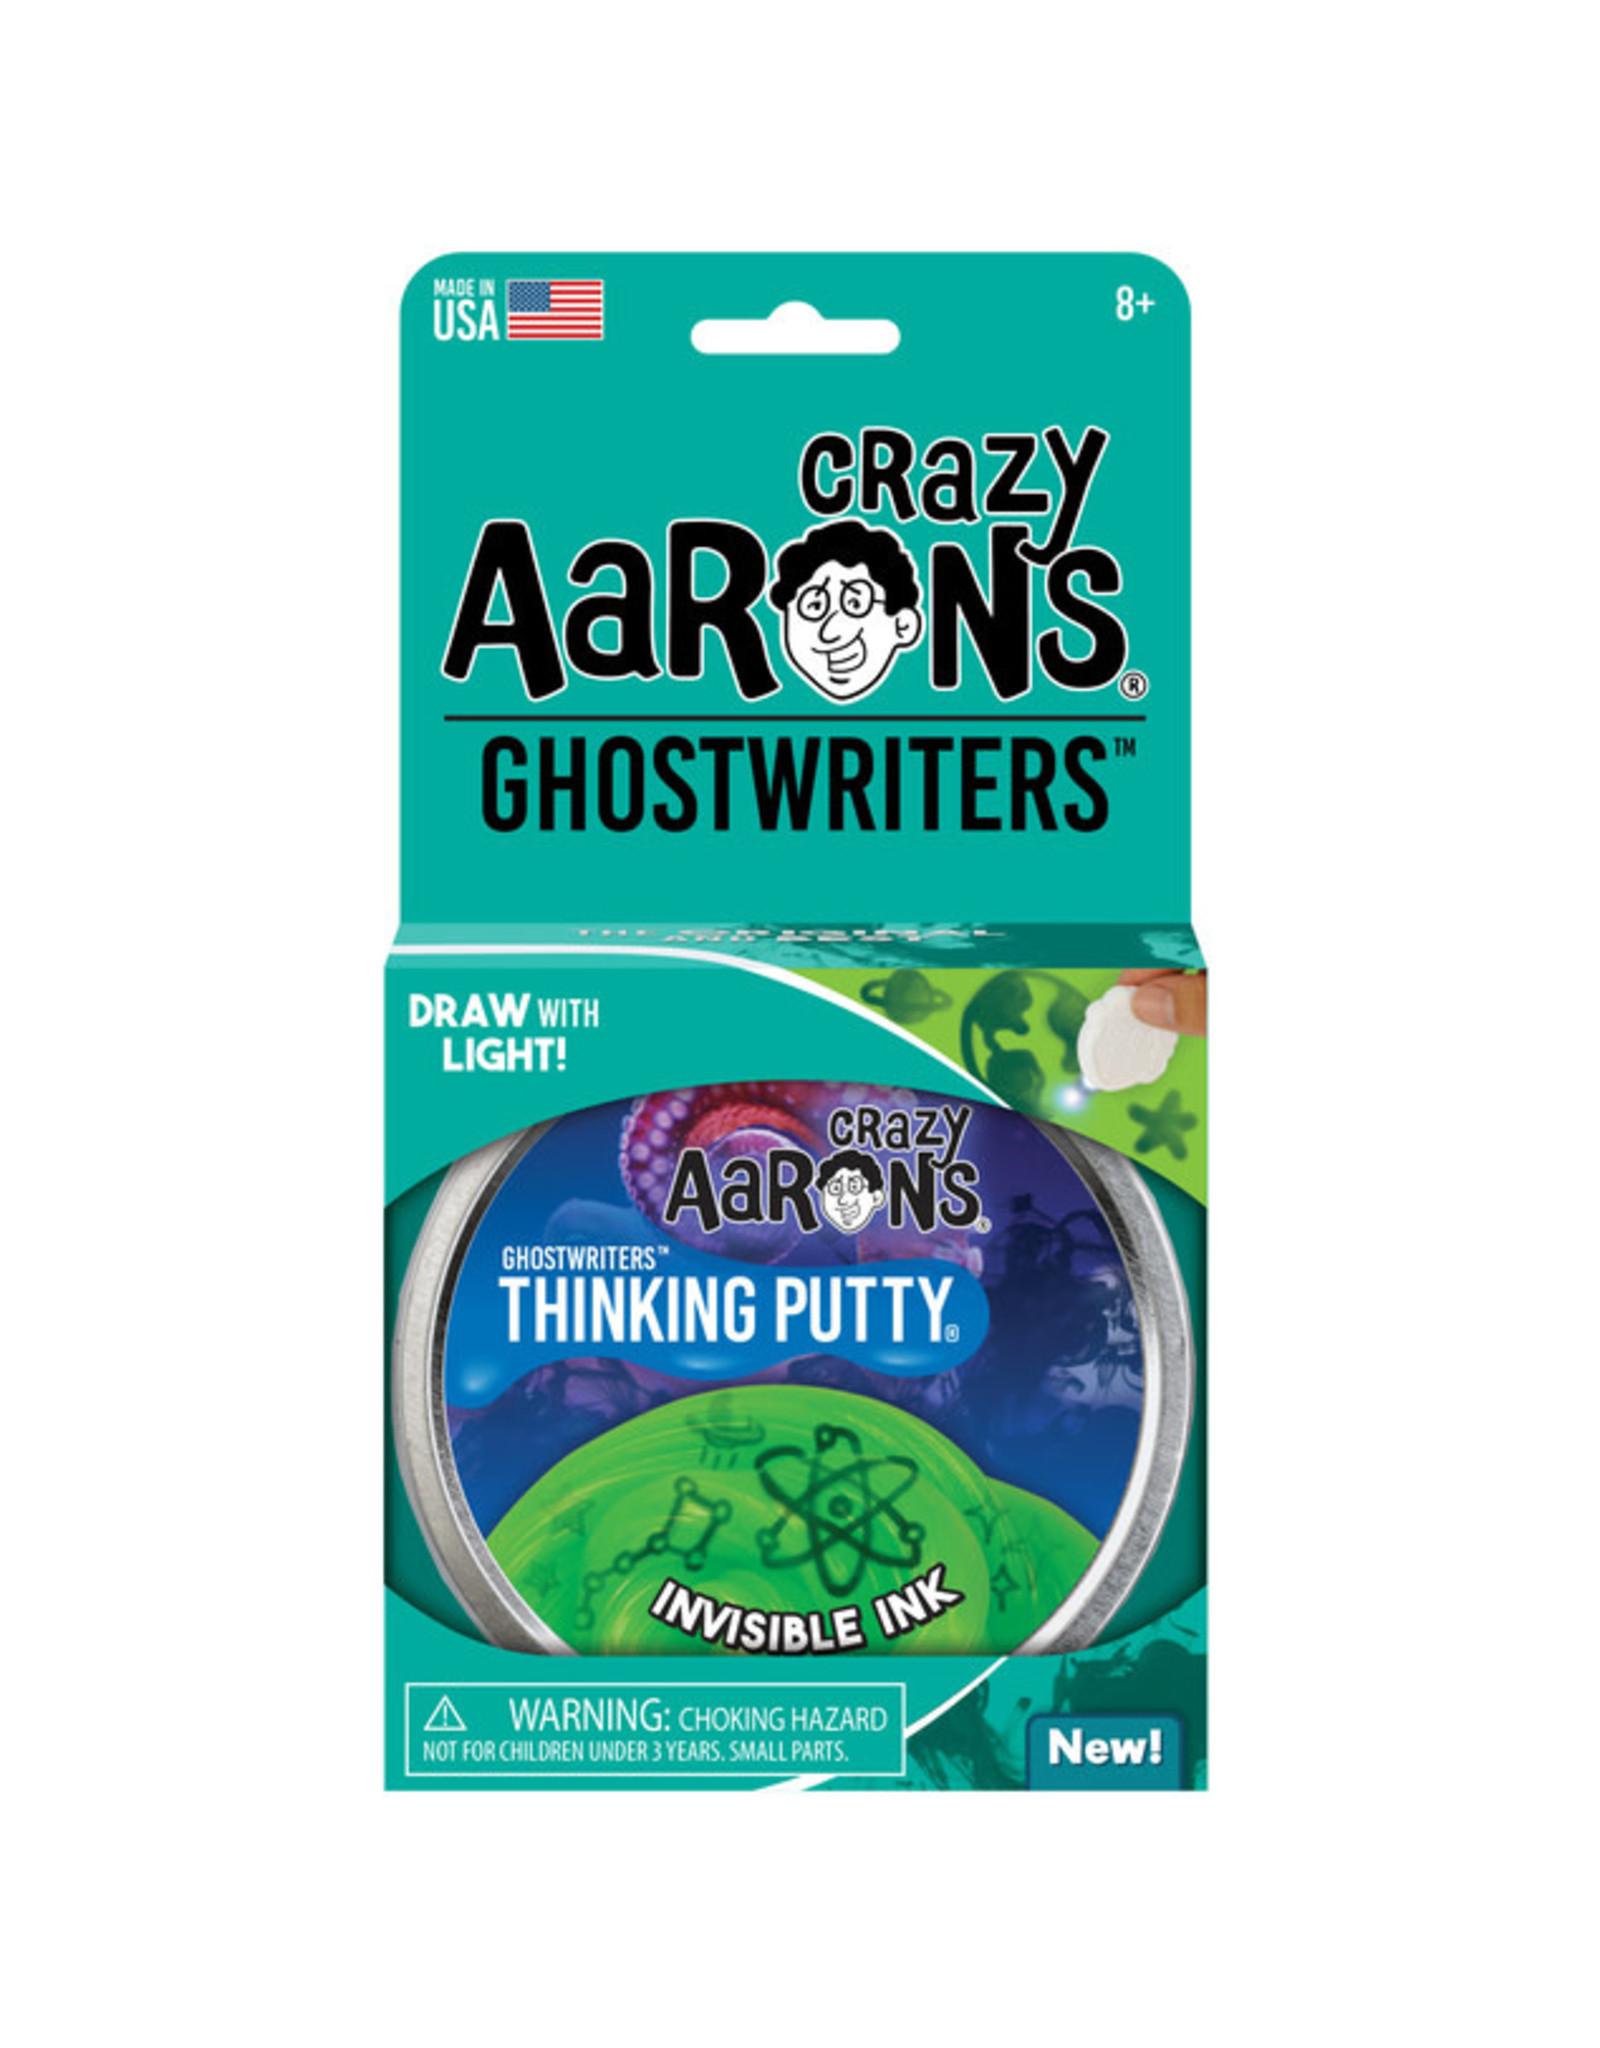 "Crazy Aaron's Crazy Aaron's 4"" Tin Invisible Ink - Ghostwriters"